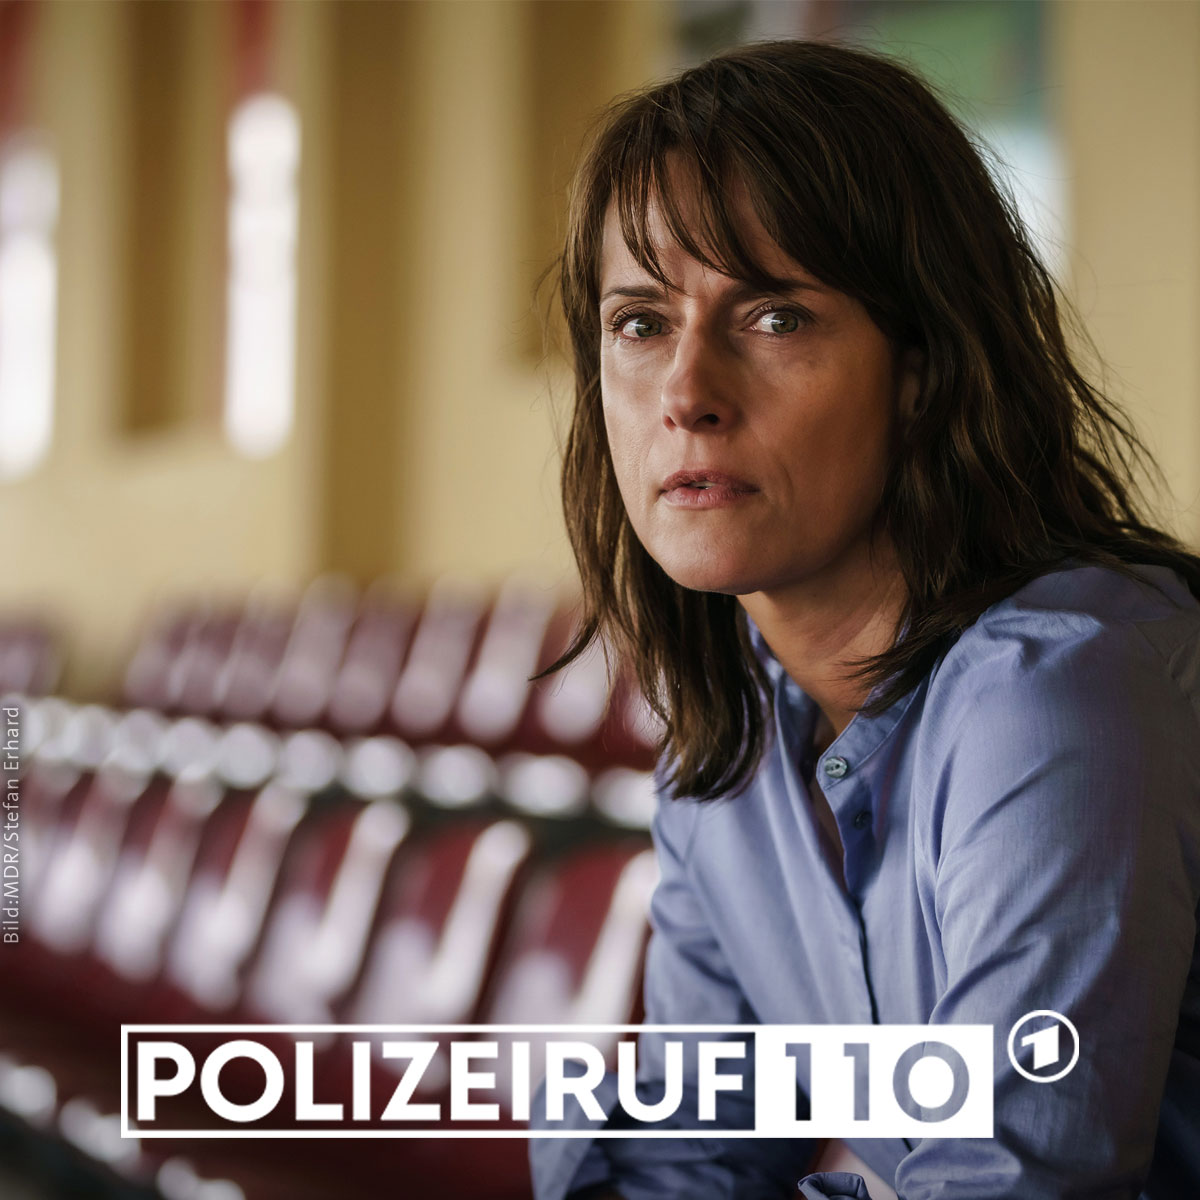 #polizeiruf110